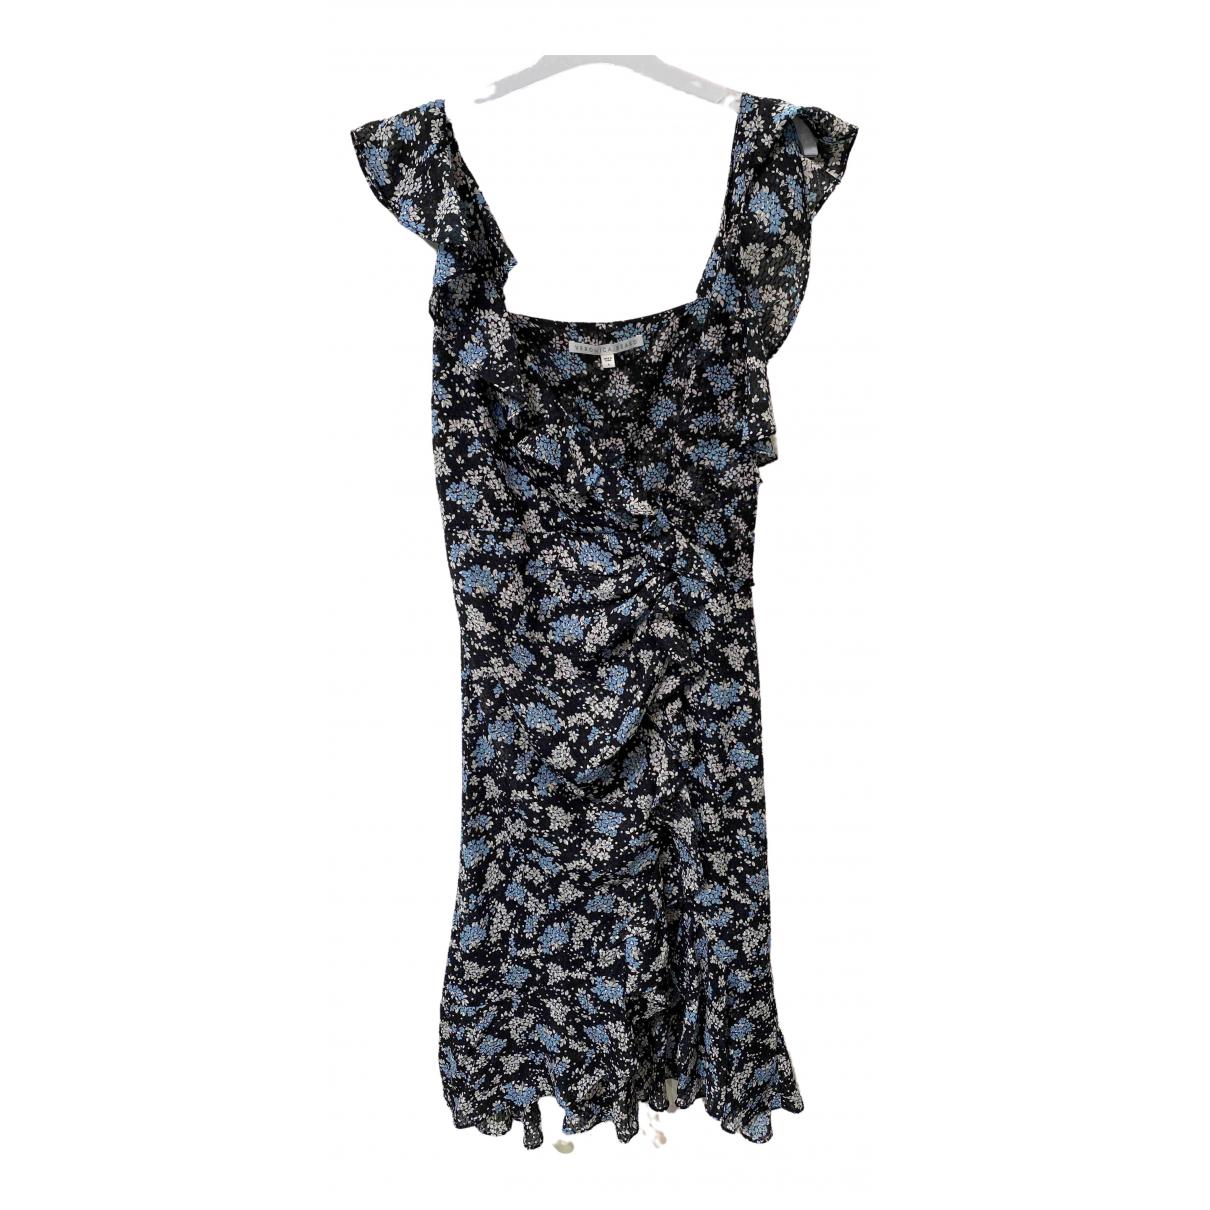 Veronica Beard \N Multicolour Silk dress for Women 4 US